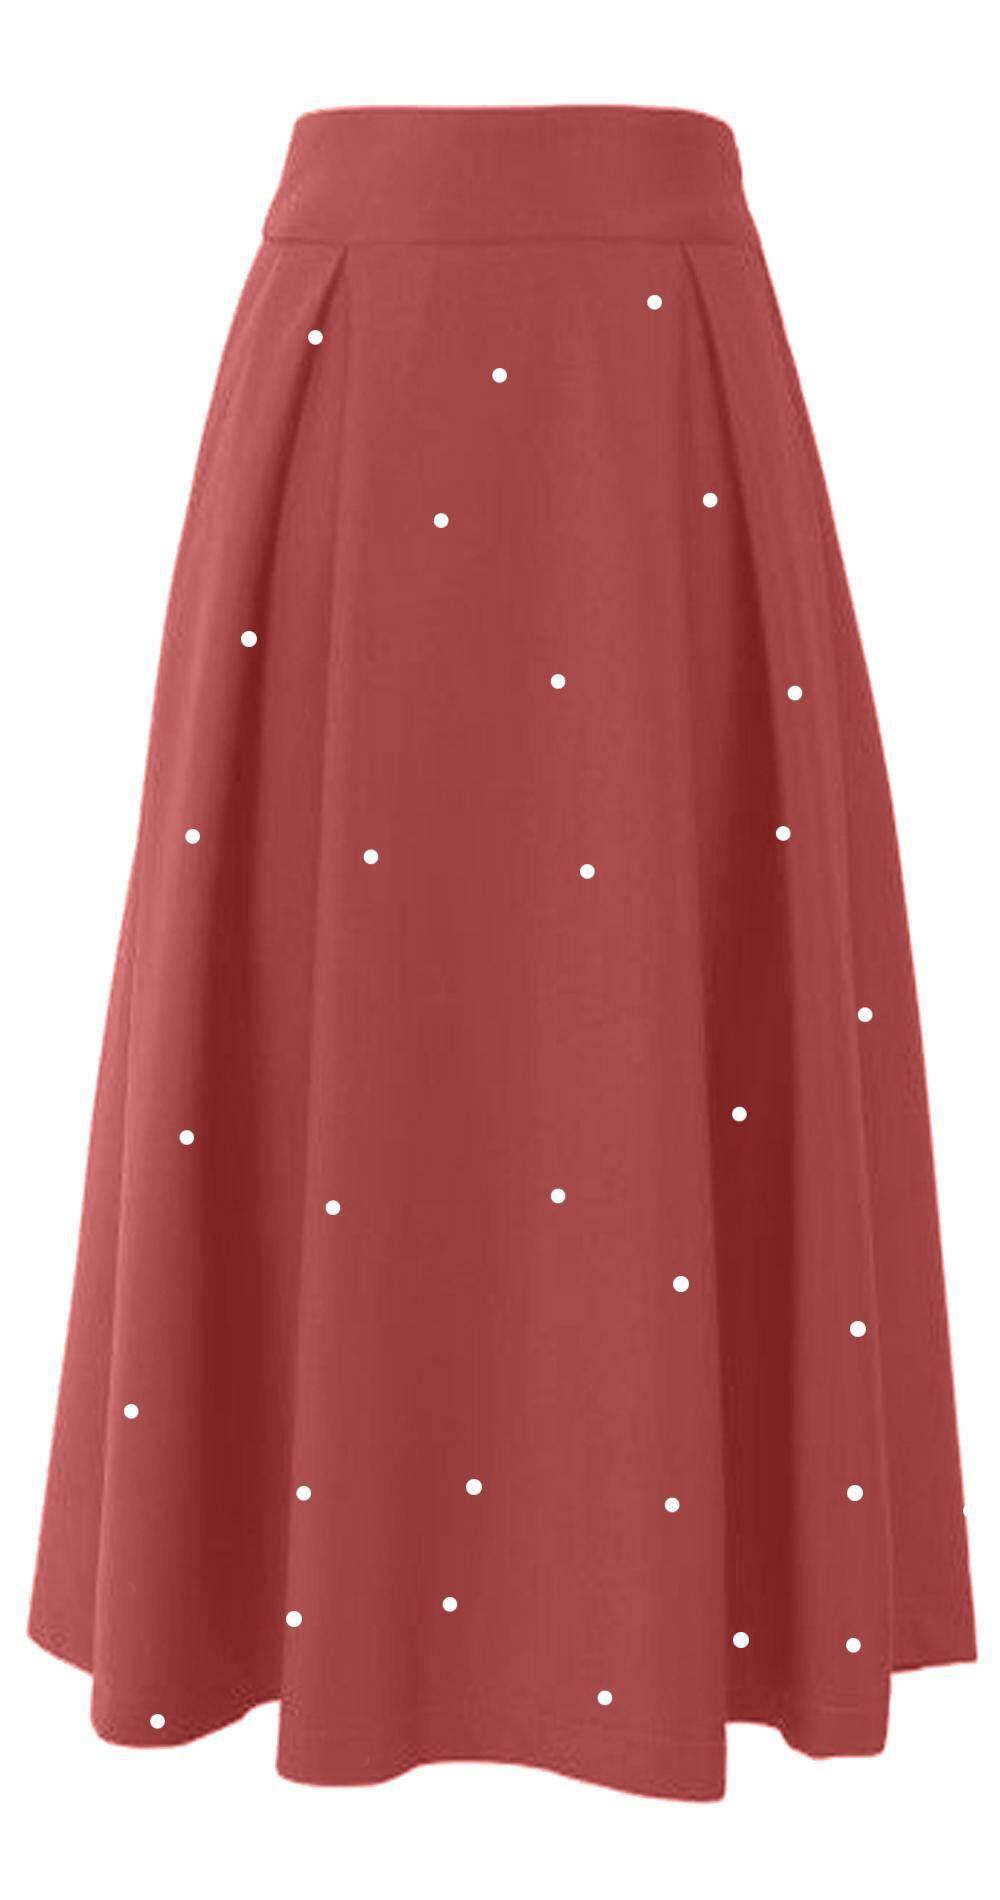 Long Skirt Crystal Design Front Panel - Starlet